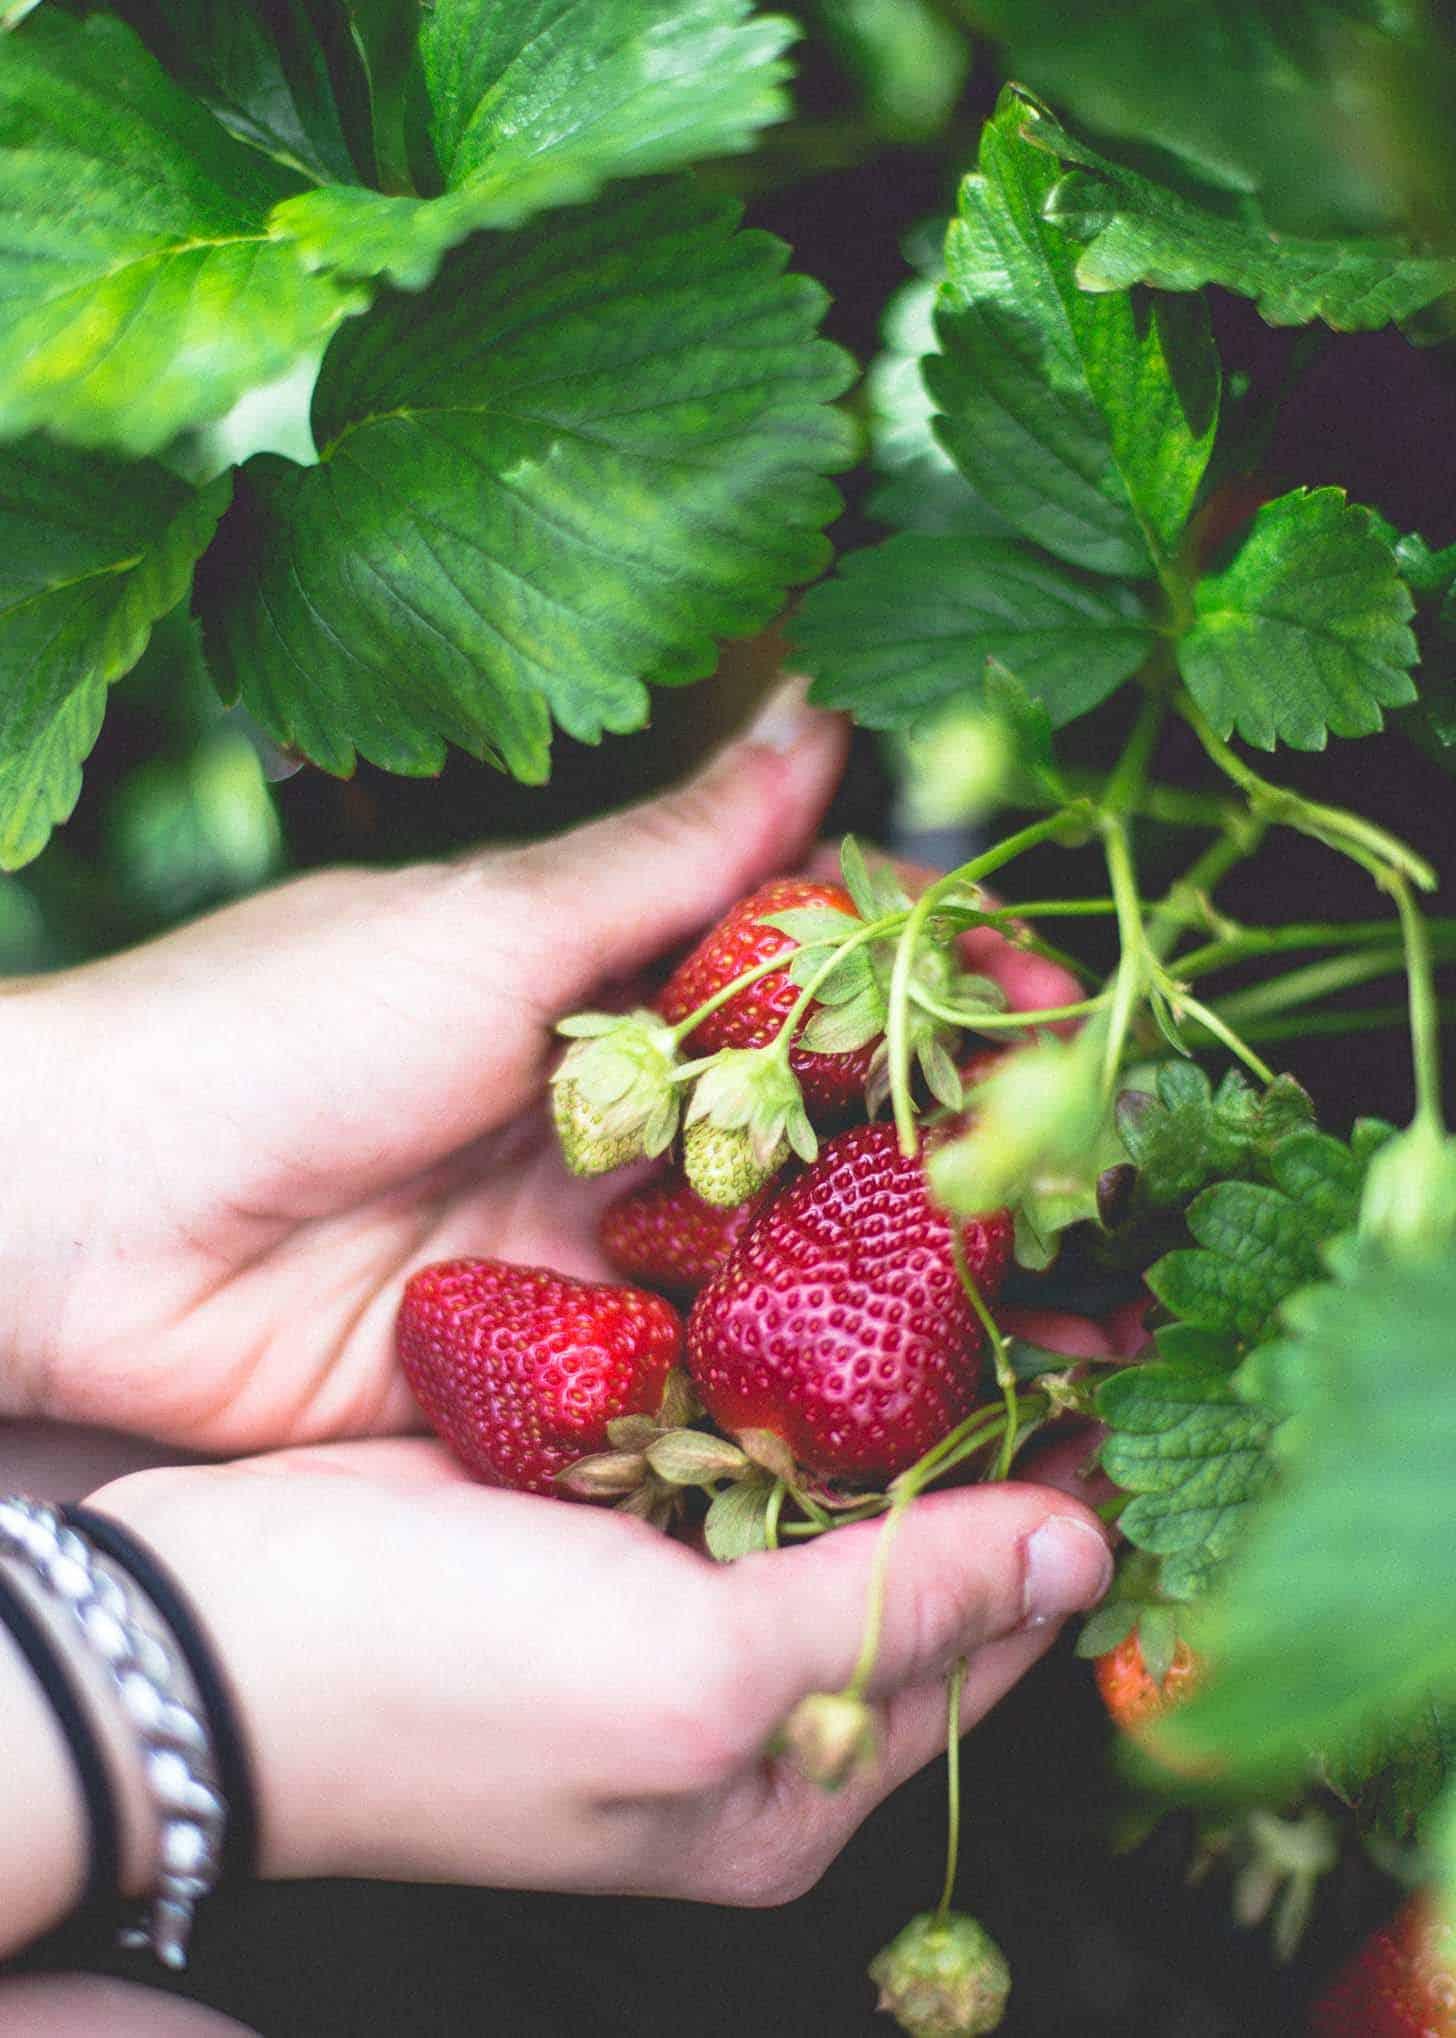 Wohletz Farm Strawberries on the vine